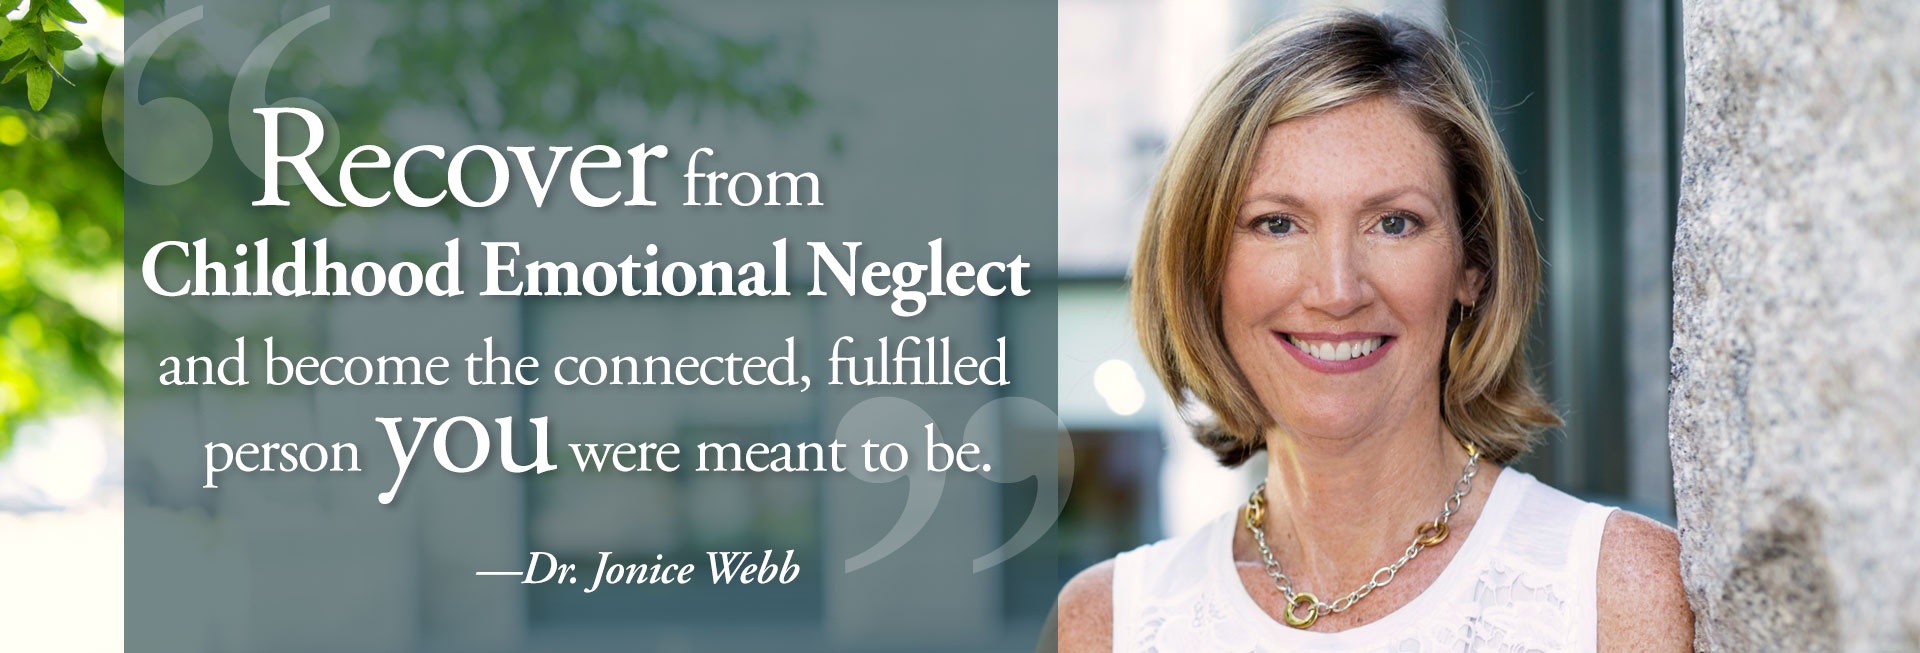 Dr. Jonice Webb - Relationship & Emotional Health Expert